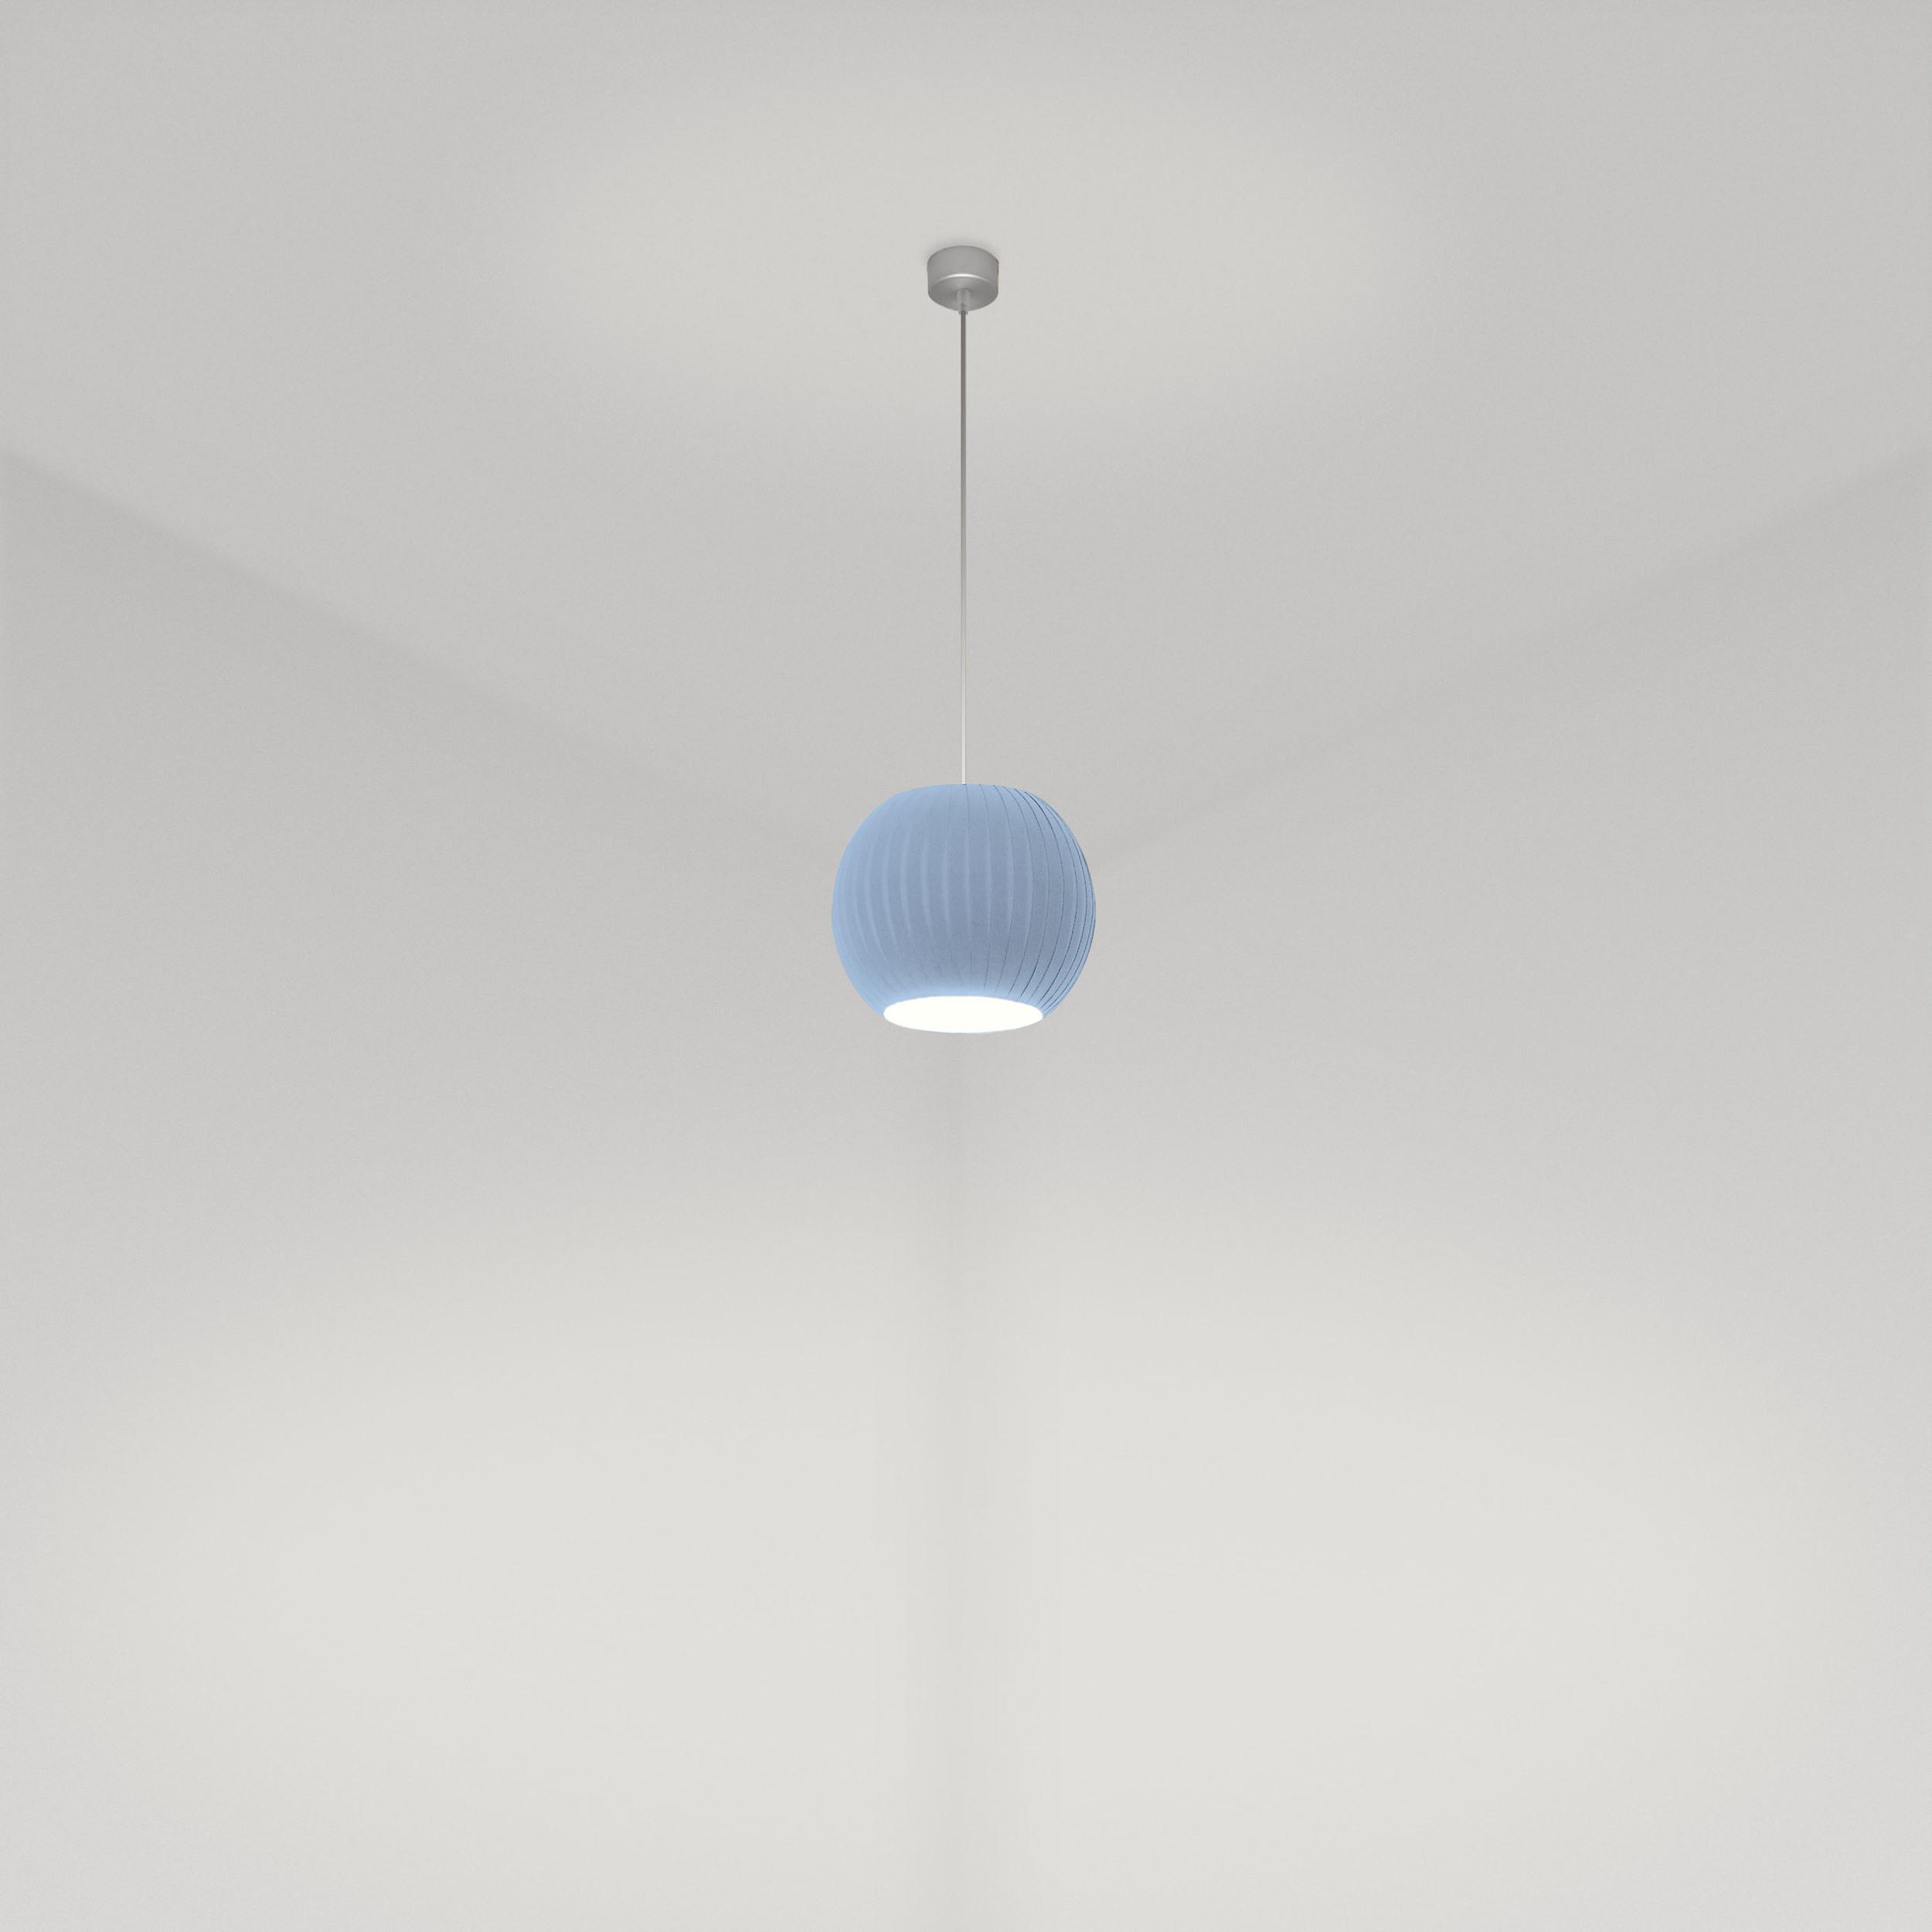 orbit_300_pendant_sky blue.jpg